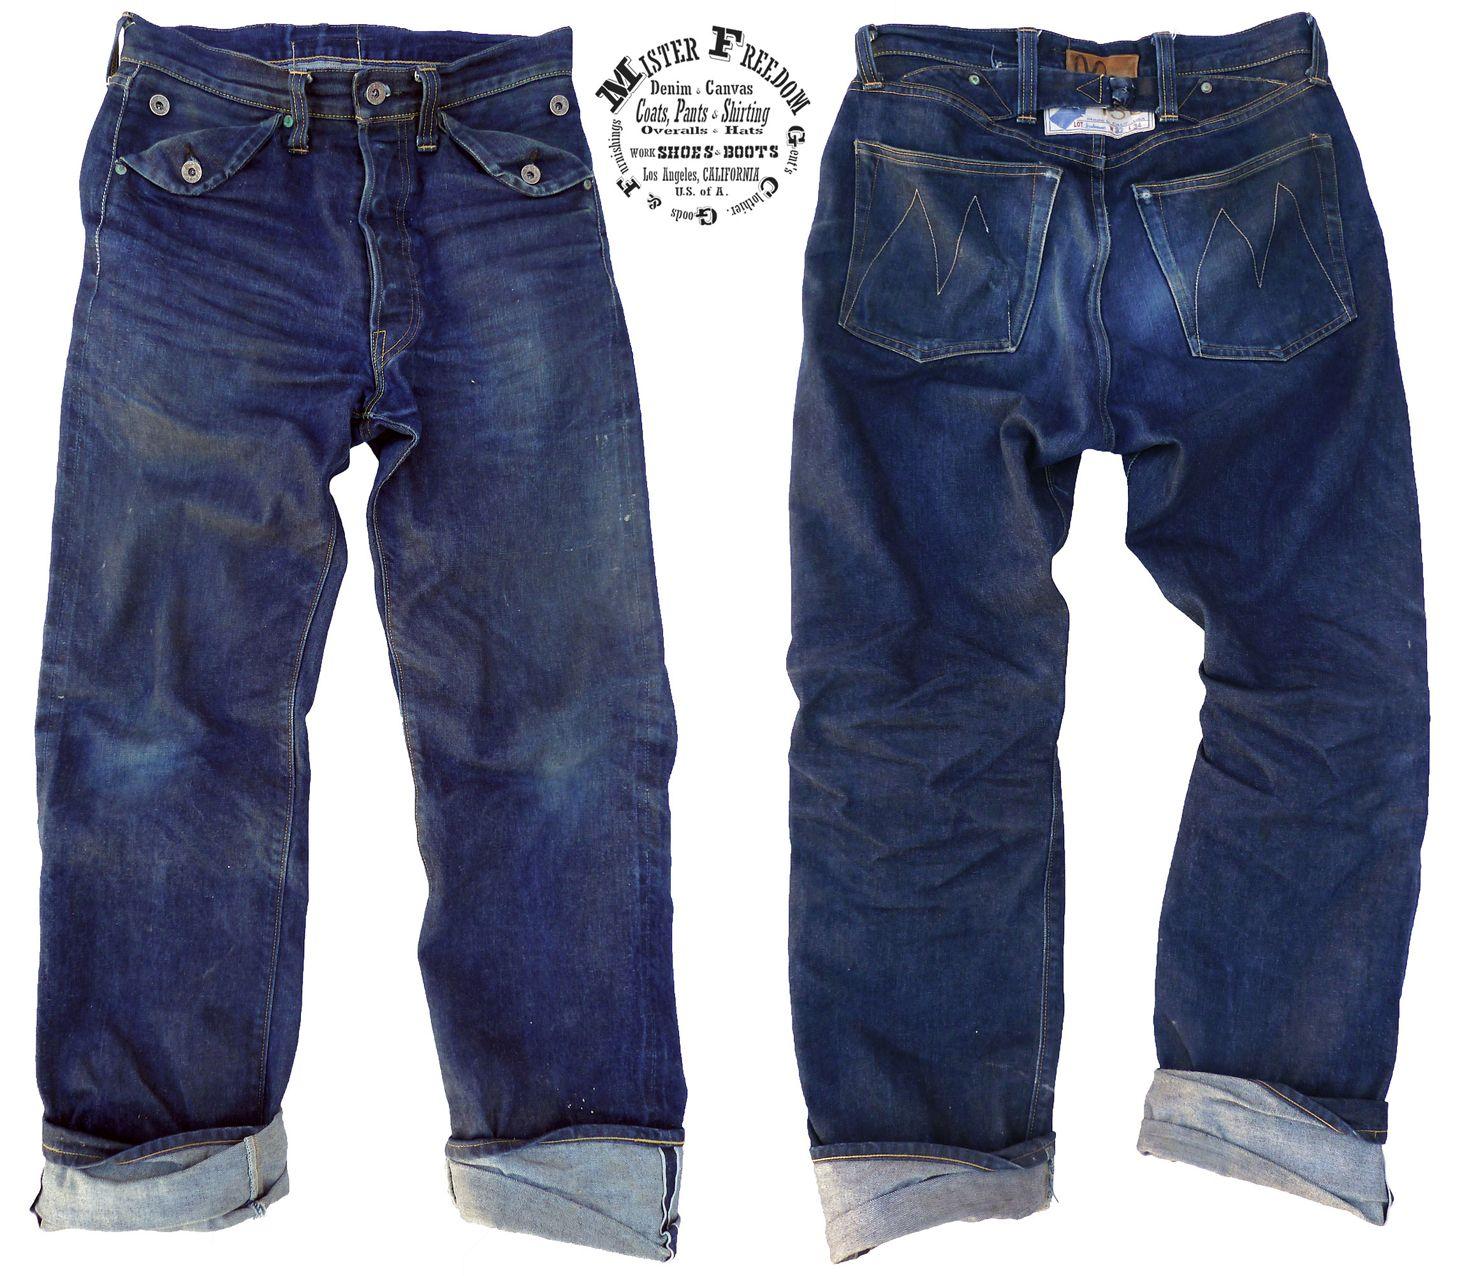 Buckaroos Mr Freedom Denim Inspiration American Casual Edwin Jeans